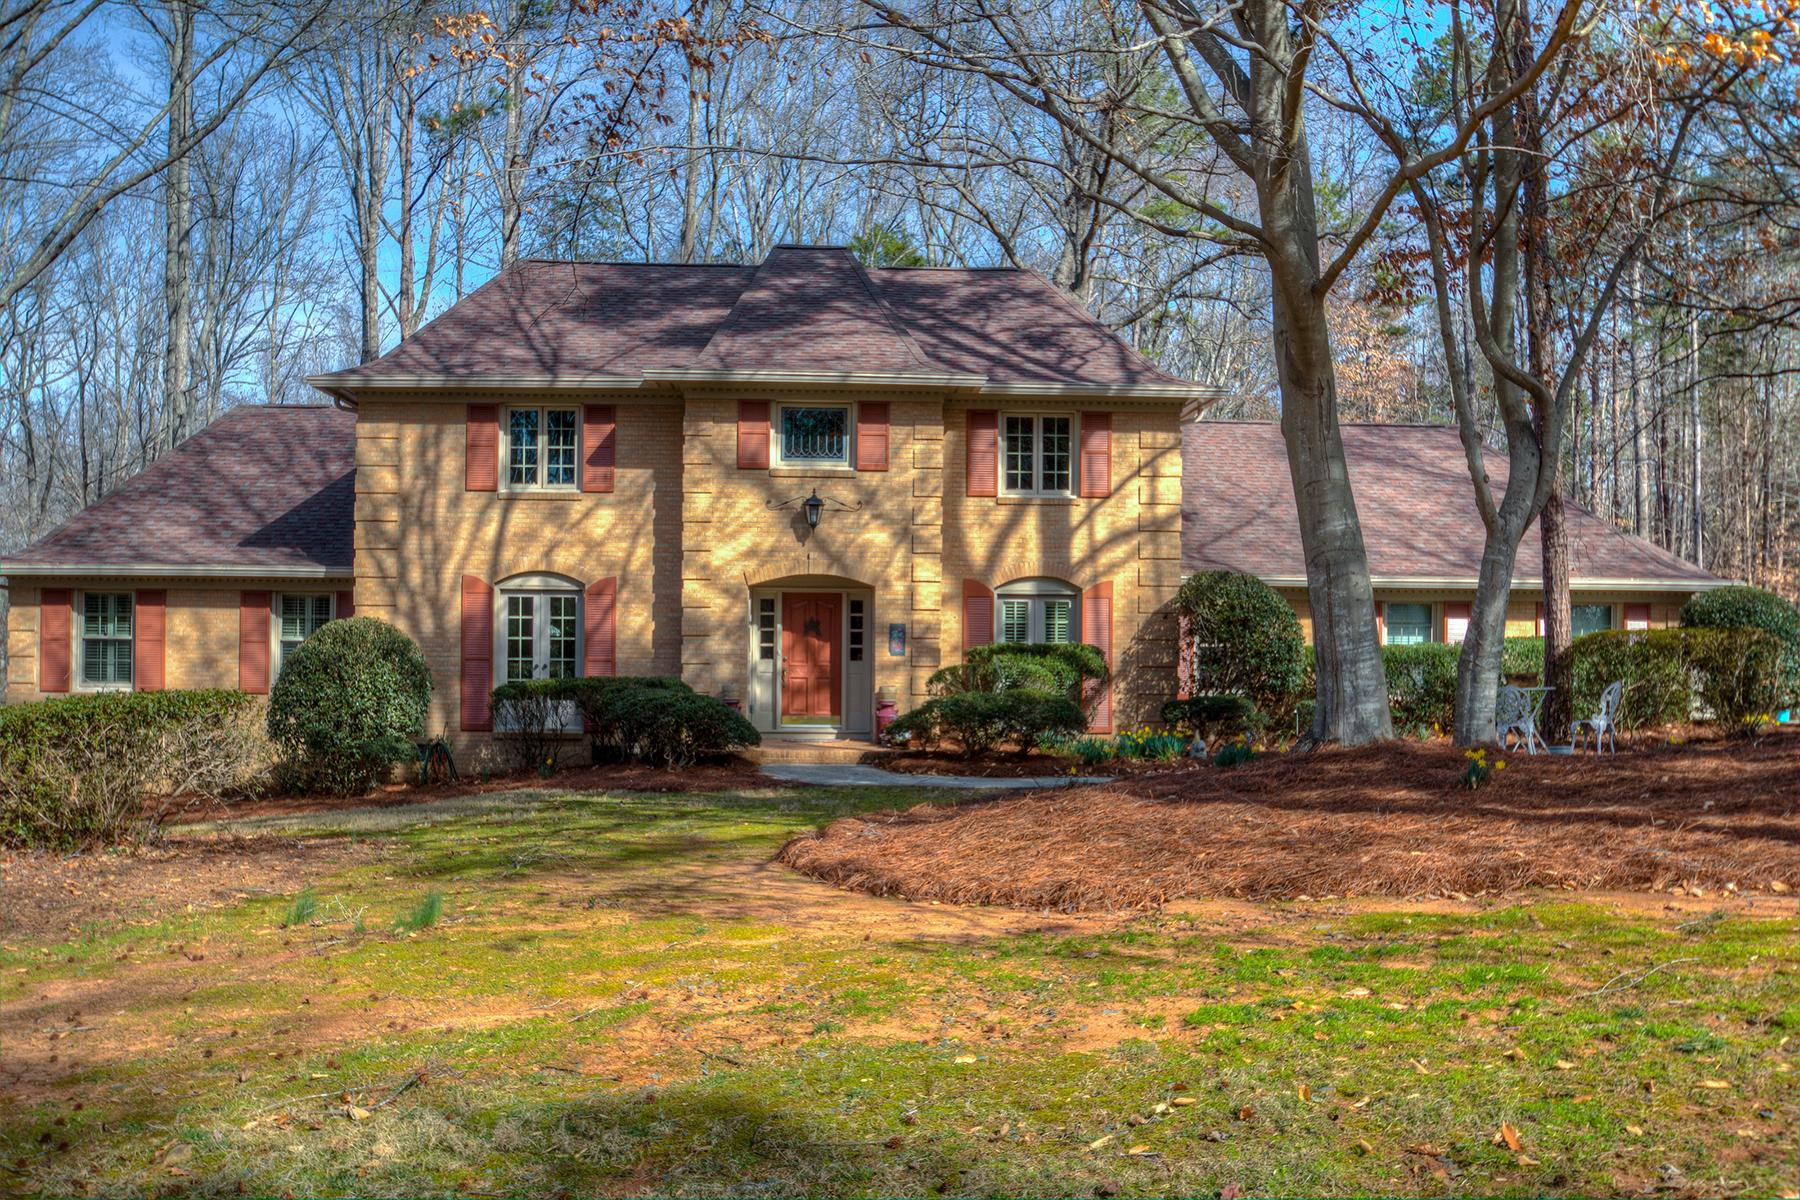 Single Family Home for Sale at PROVIDENCE PLANTATION 4000 High Ridge Rd, Charlotte, North Carolina 28270 United States